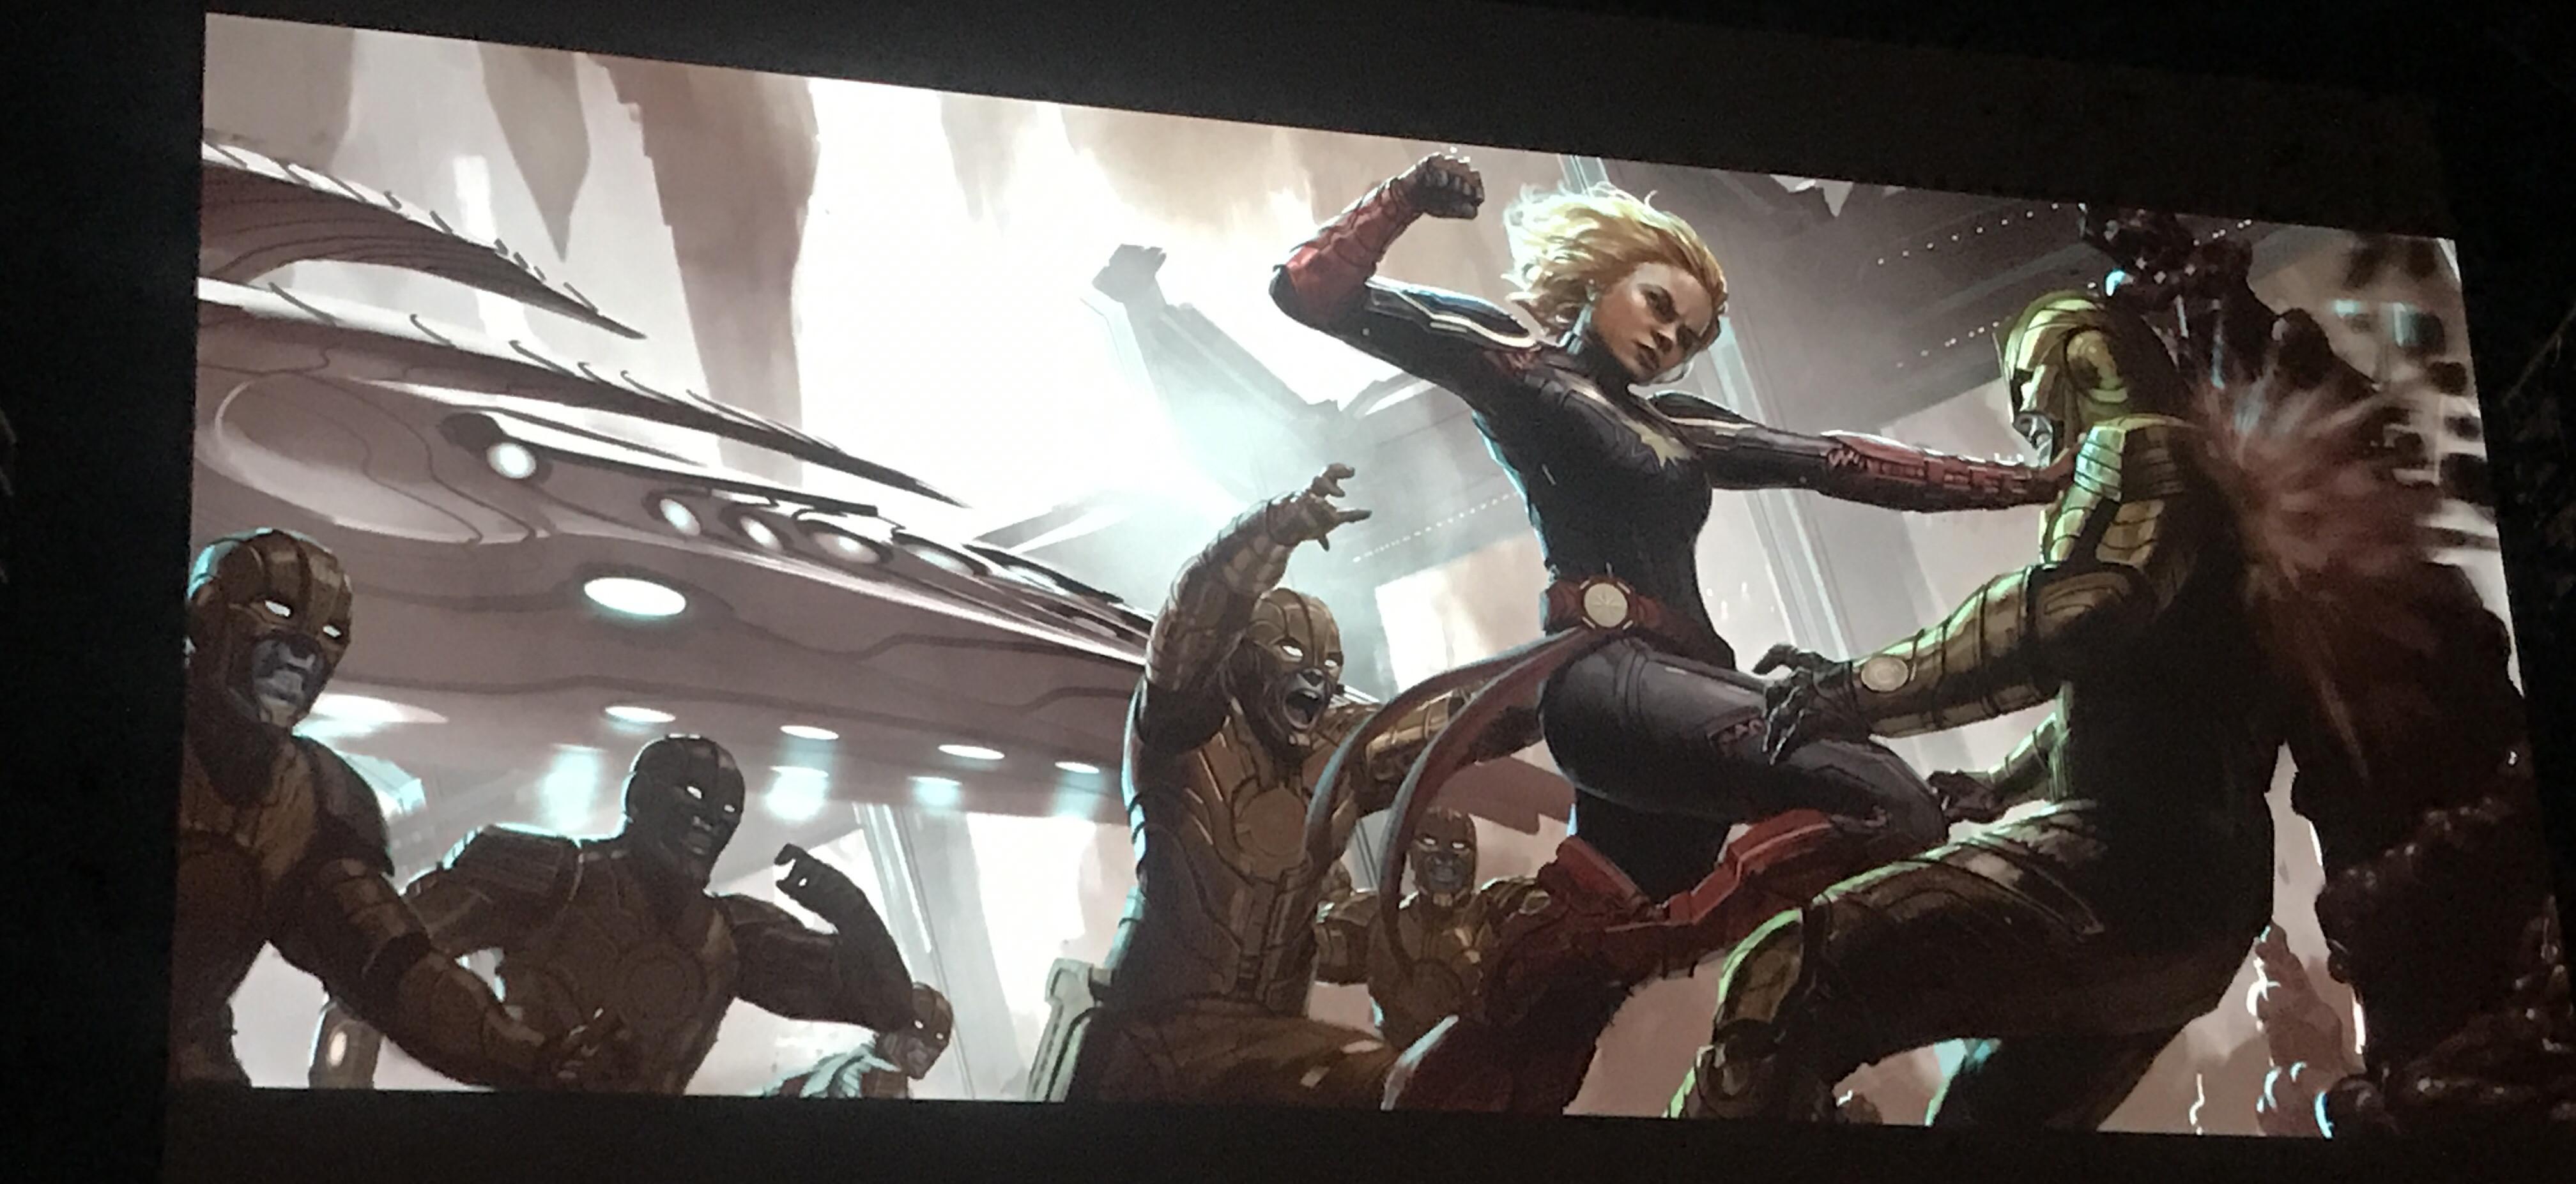 captain marvel concept art revealedartist andy park